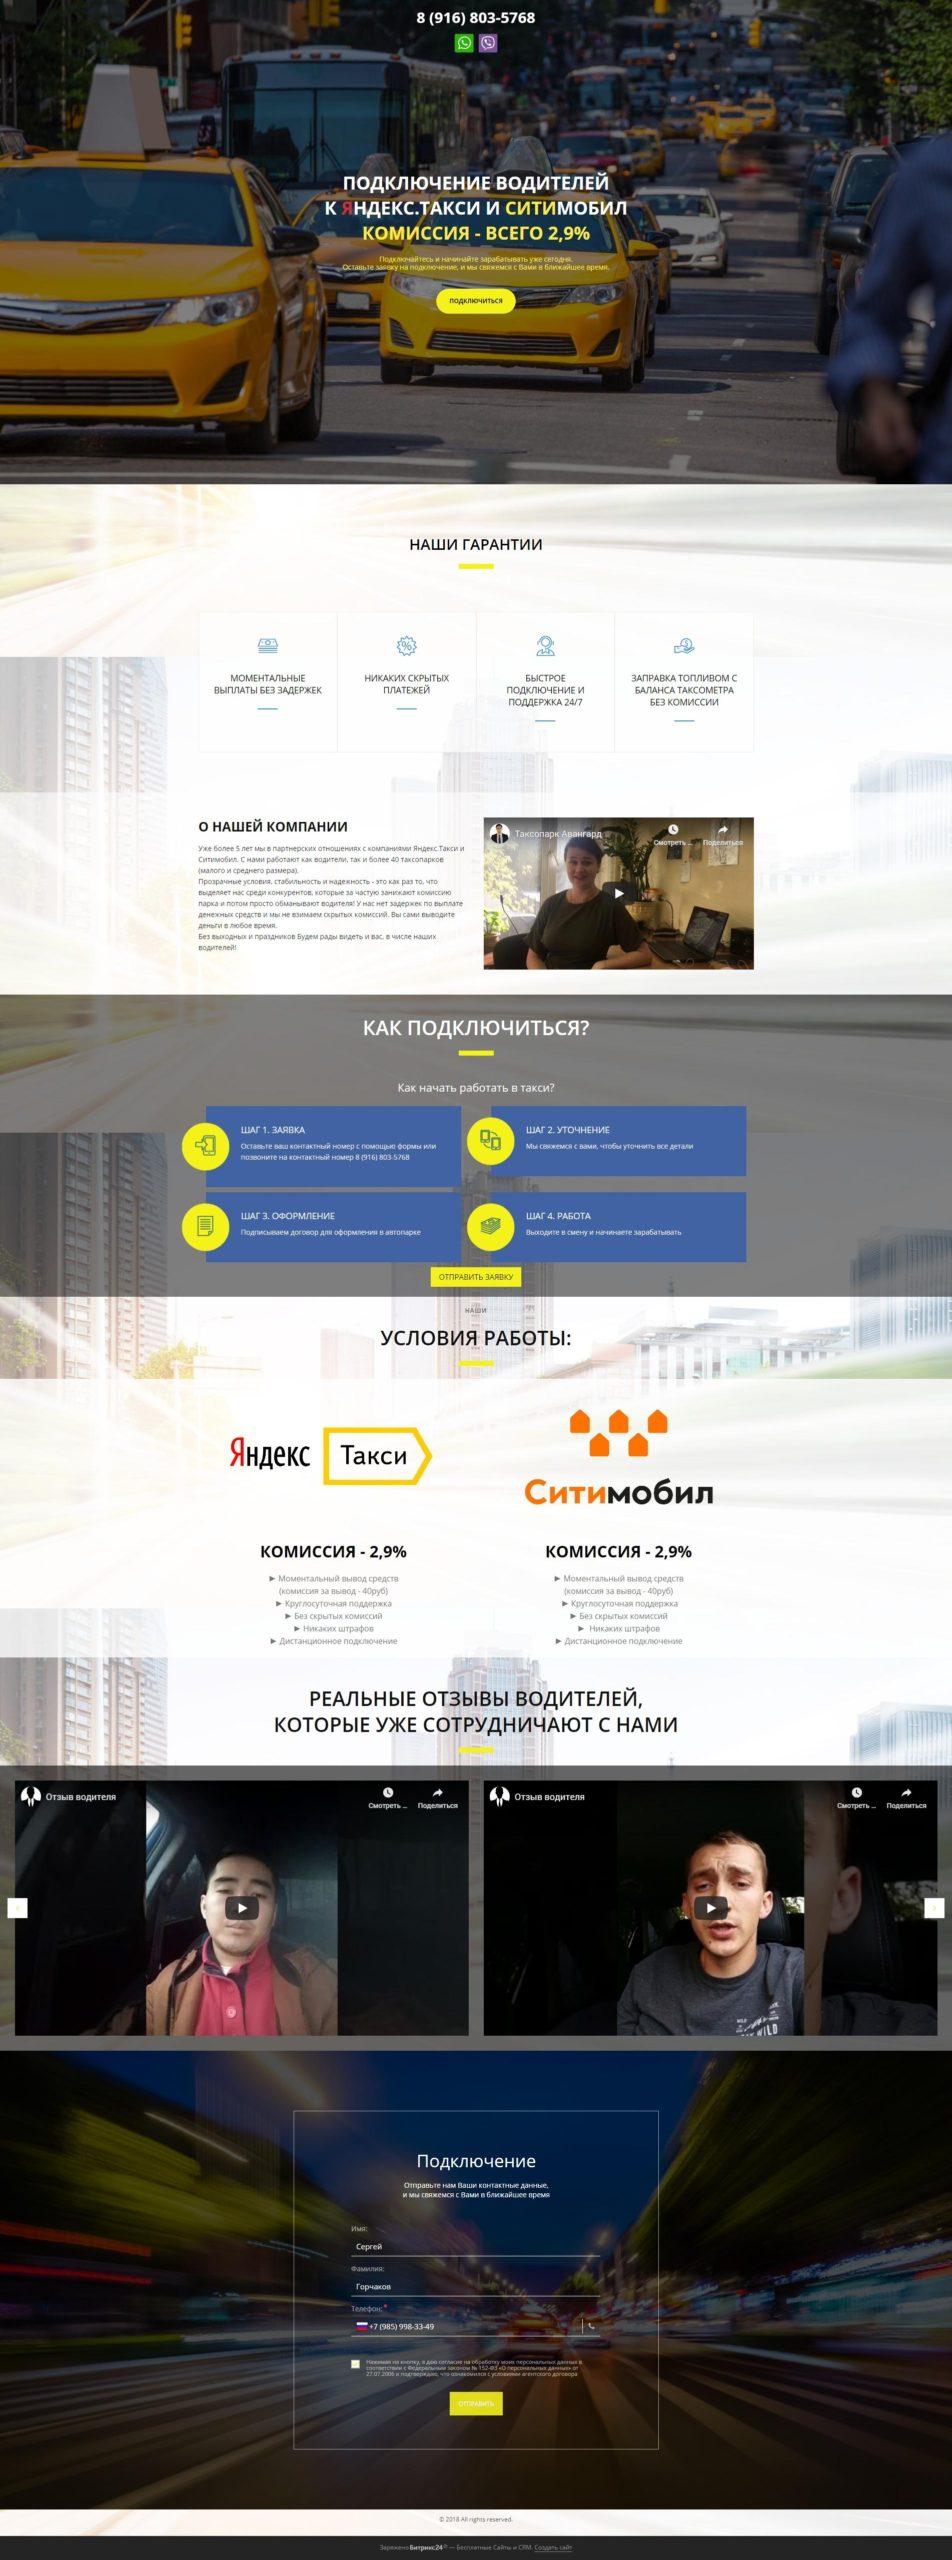 Битрикс сайты